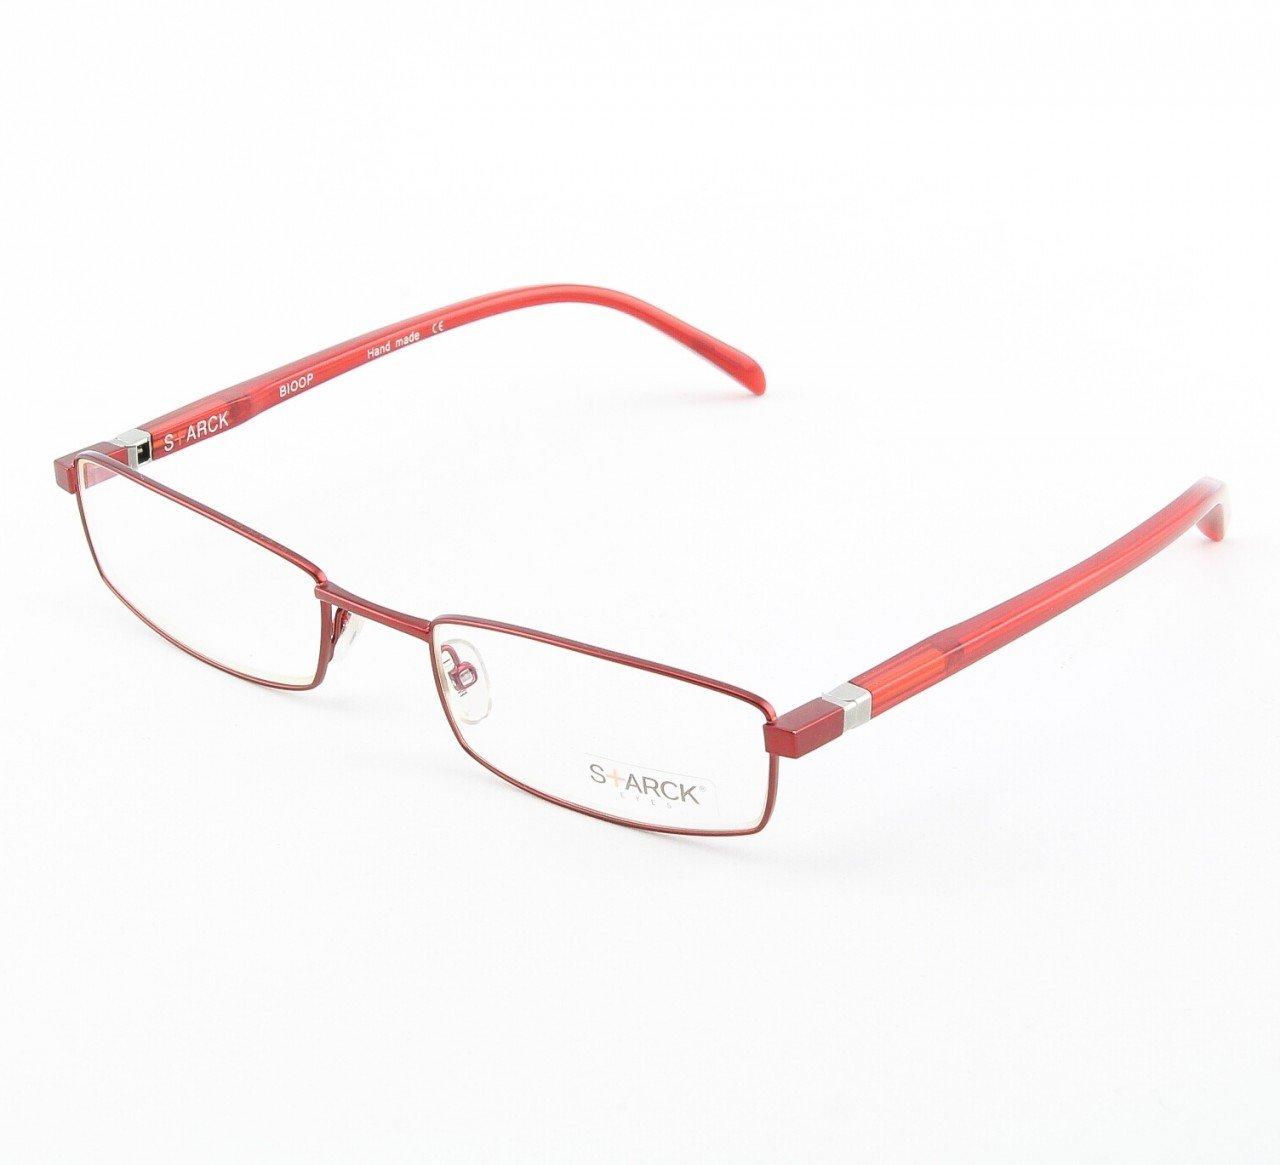 Alain Mikli Eyeglasses AL0613 Col. 14 Dark Raspberry Metallic Frame with Black and Red Temples